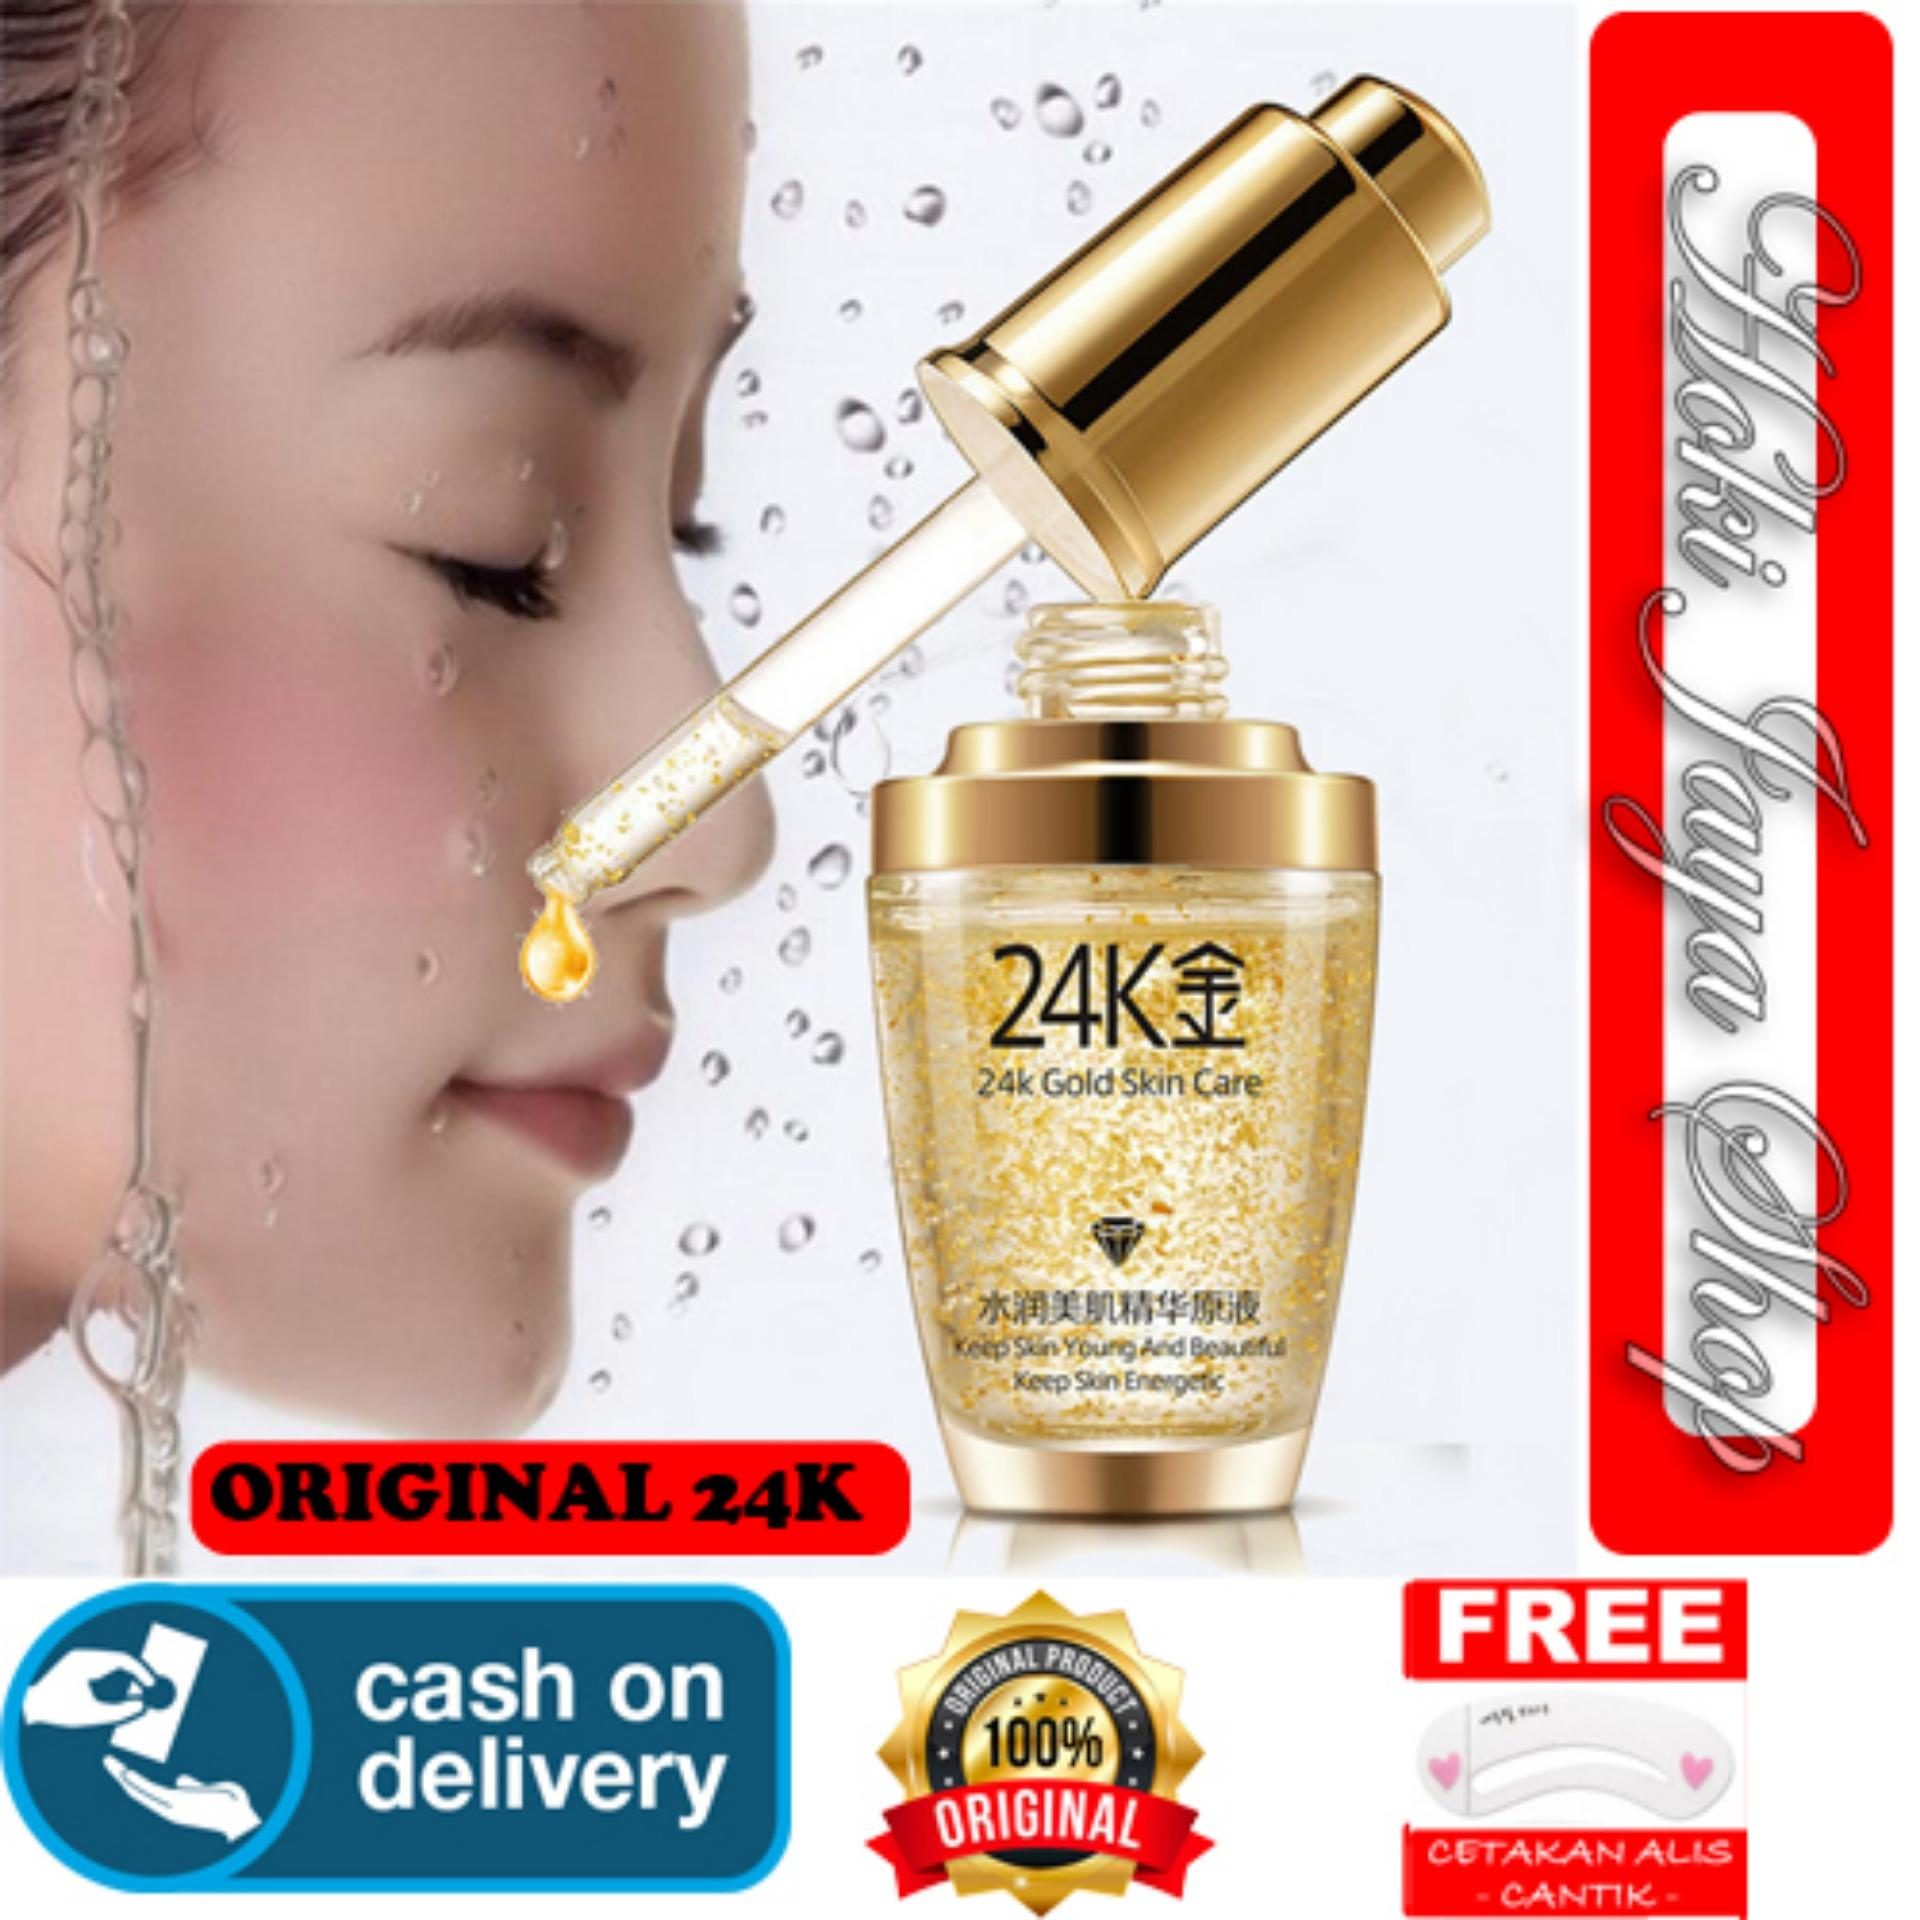 HOKI COD - Serum Wajah Emas 24K Bioaqua 24k Gold Bioaqua bb refill Cushion Skin Care Penghilang Kantung Mata dan Kerutan Wajah + Gratis Cetak Alis Cantik Premium - 1 Pcs